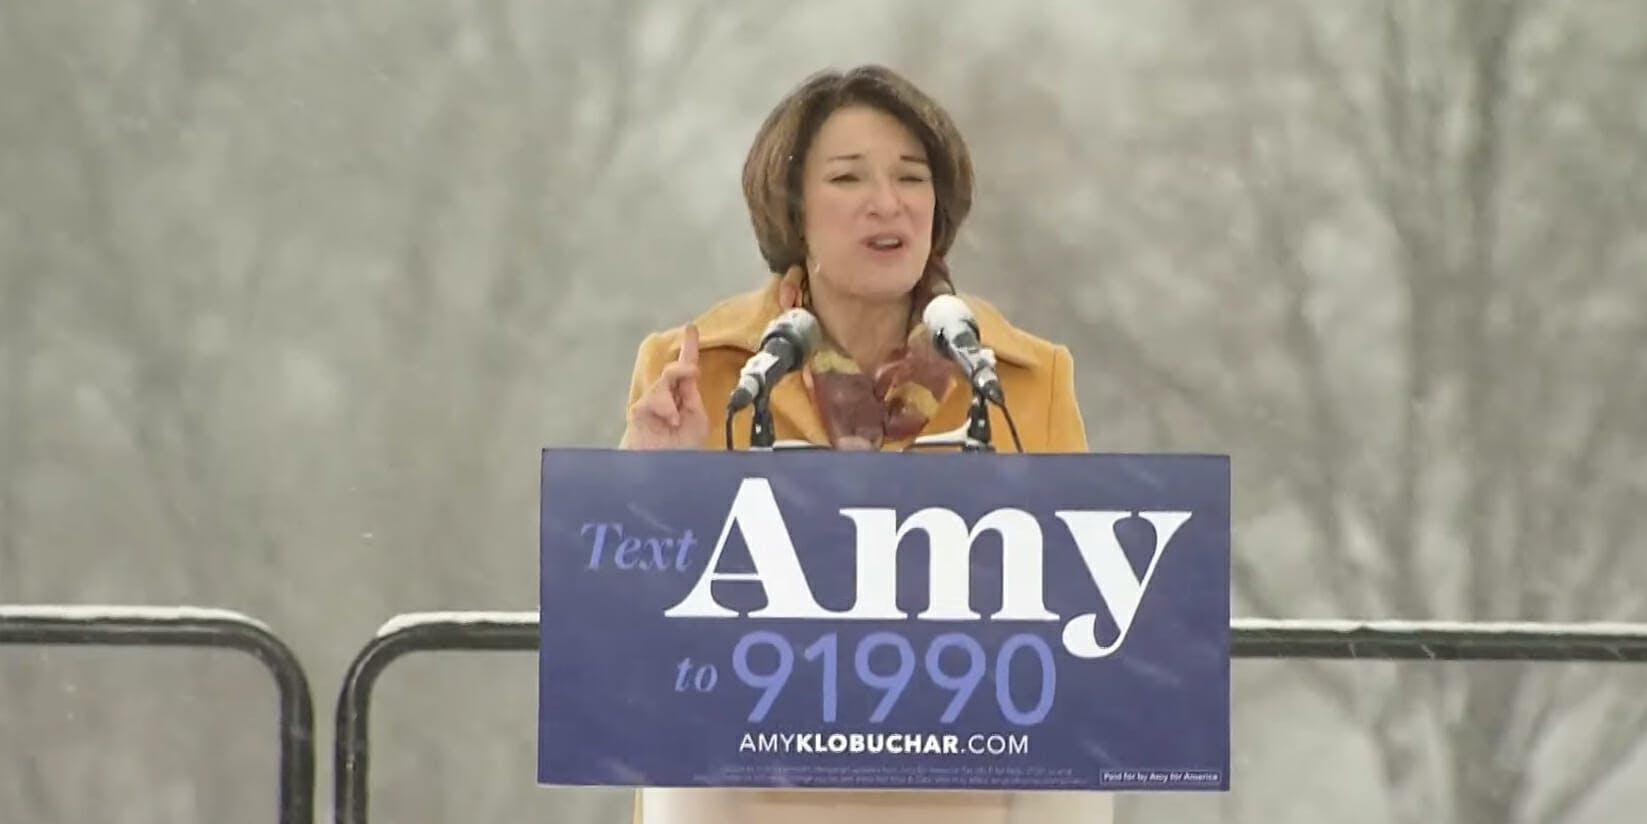 Amy Klobuchar Net Neutrality 2020 Speech